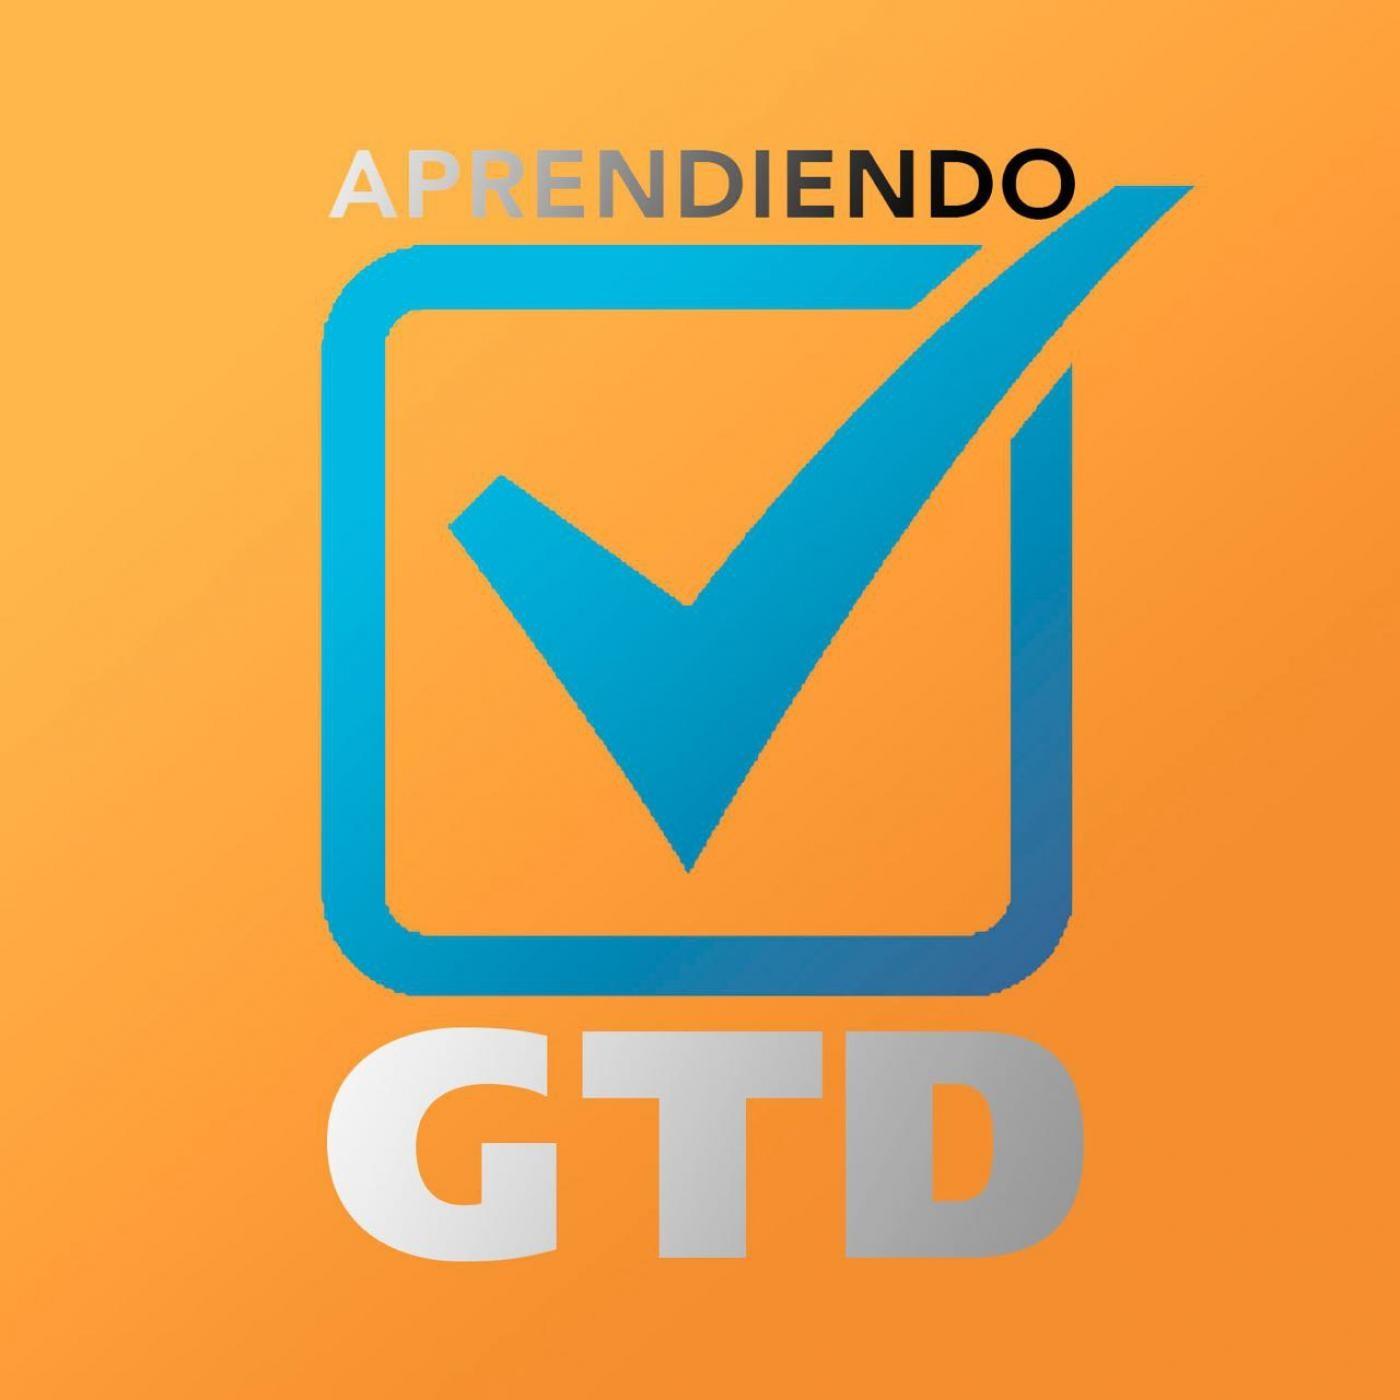 Logo de Aprendiendo GTD podcast